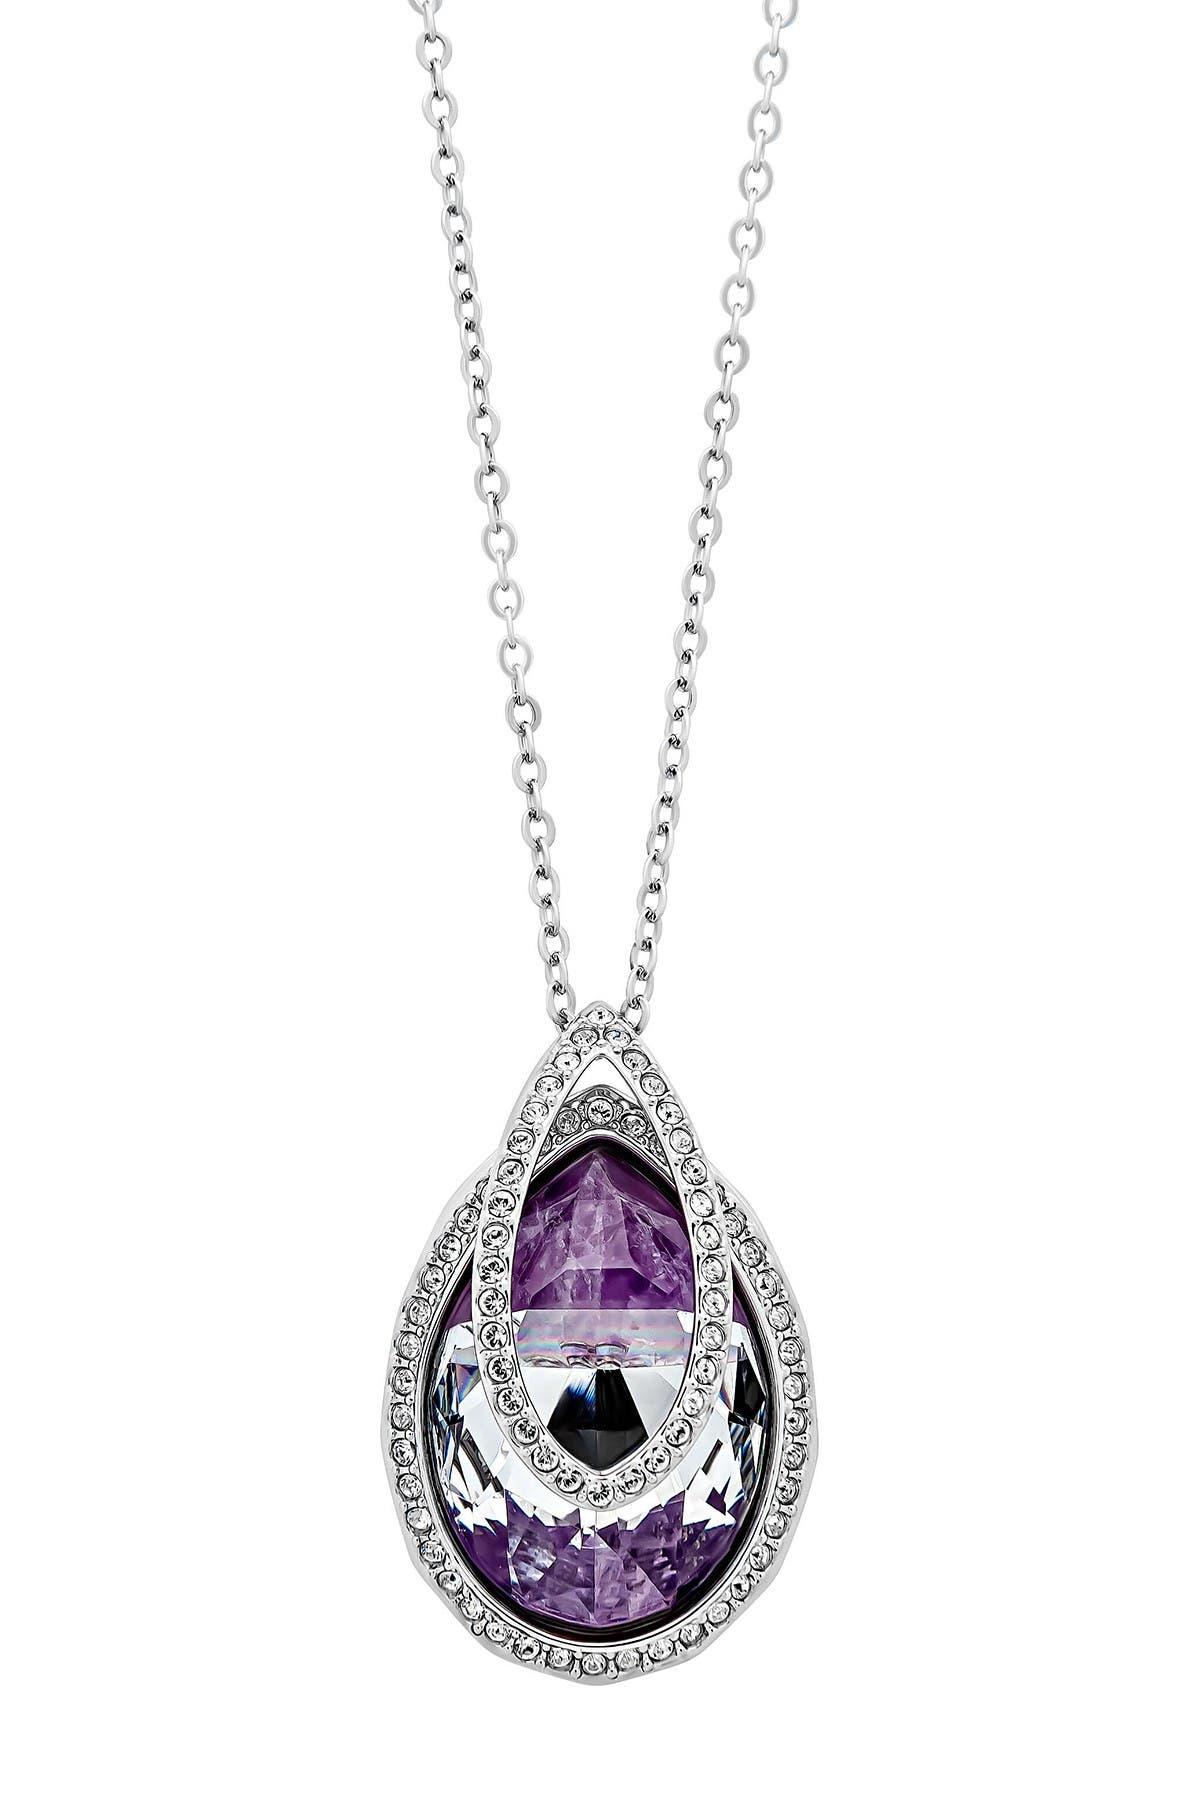 Image of Swarovski Rhodium Plated Swarovski Crystal Dew Florette Pendant Necklace